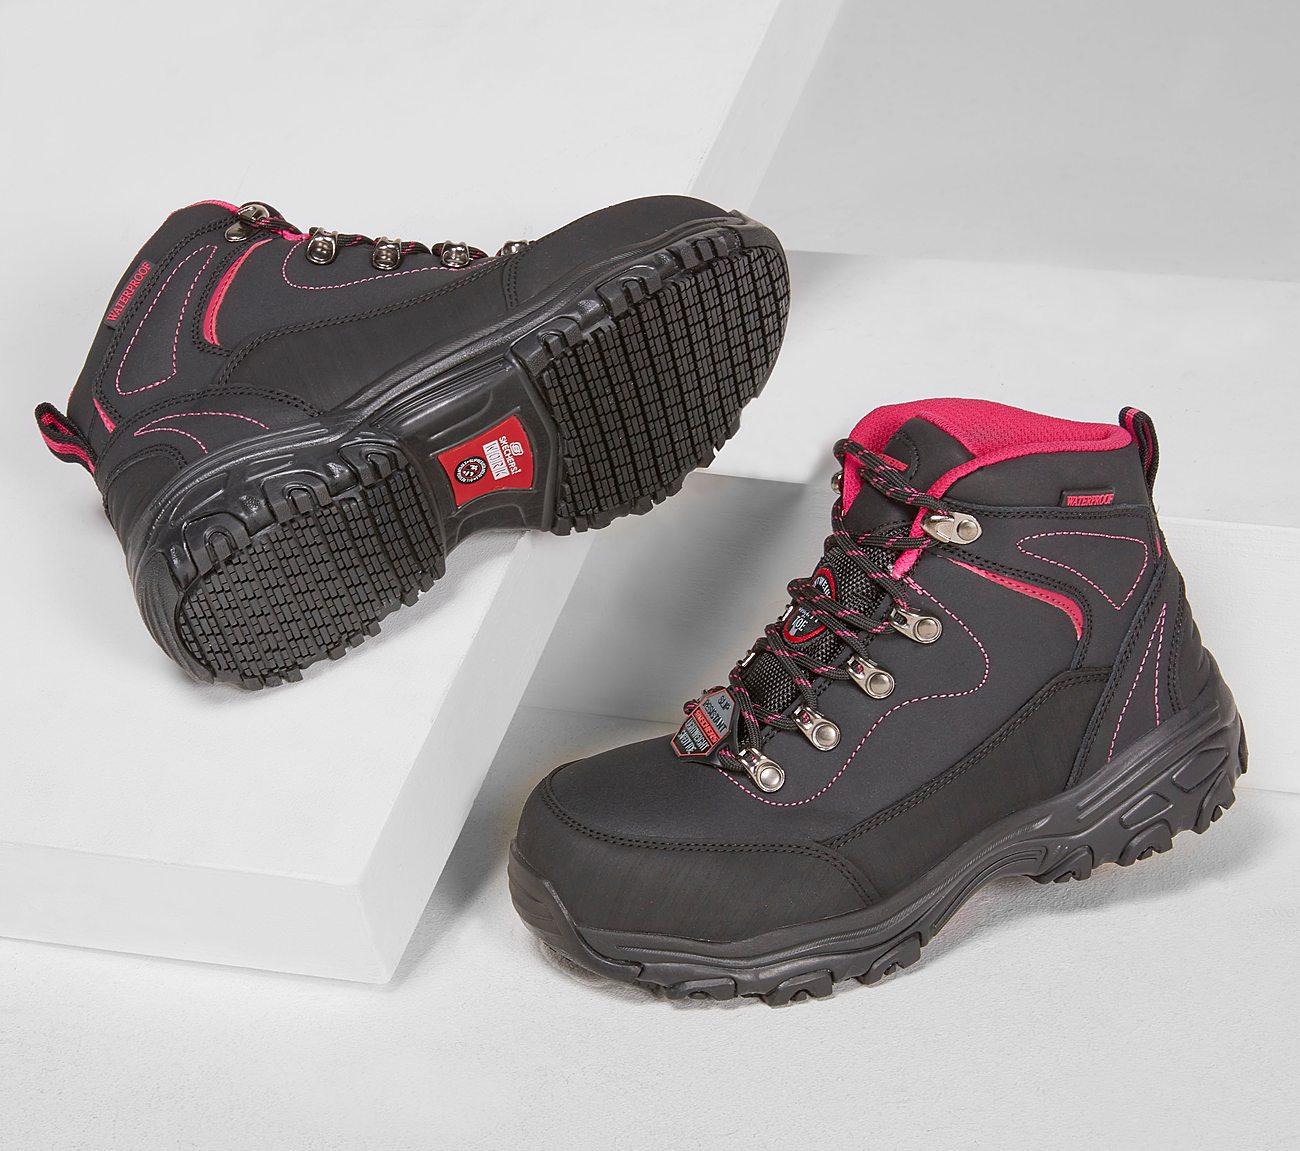 23f7f5f5d203 Buy SKECHERS Work  D Lites SR - Amasa Alloy Toe Work Shoes only  92.00